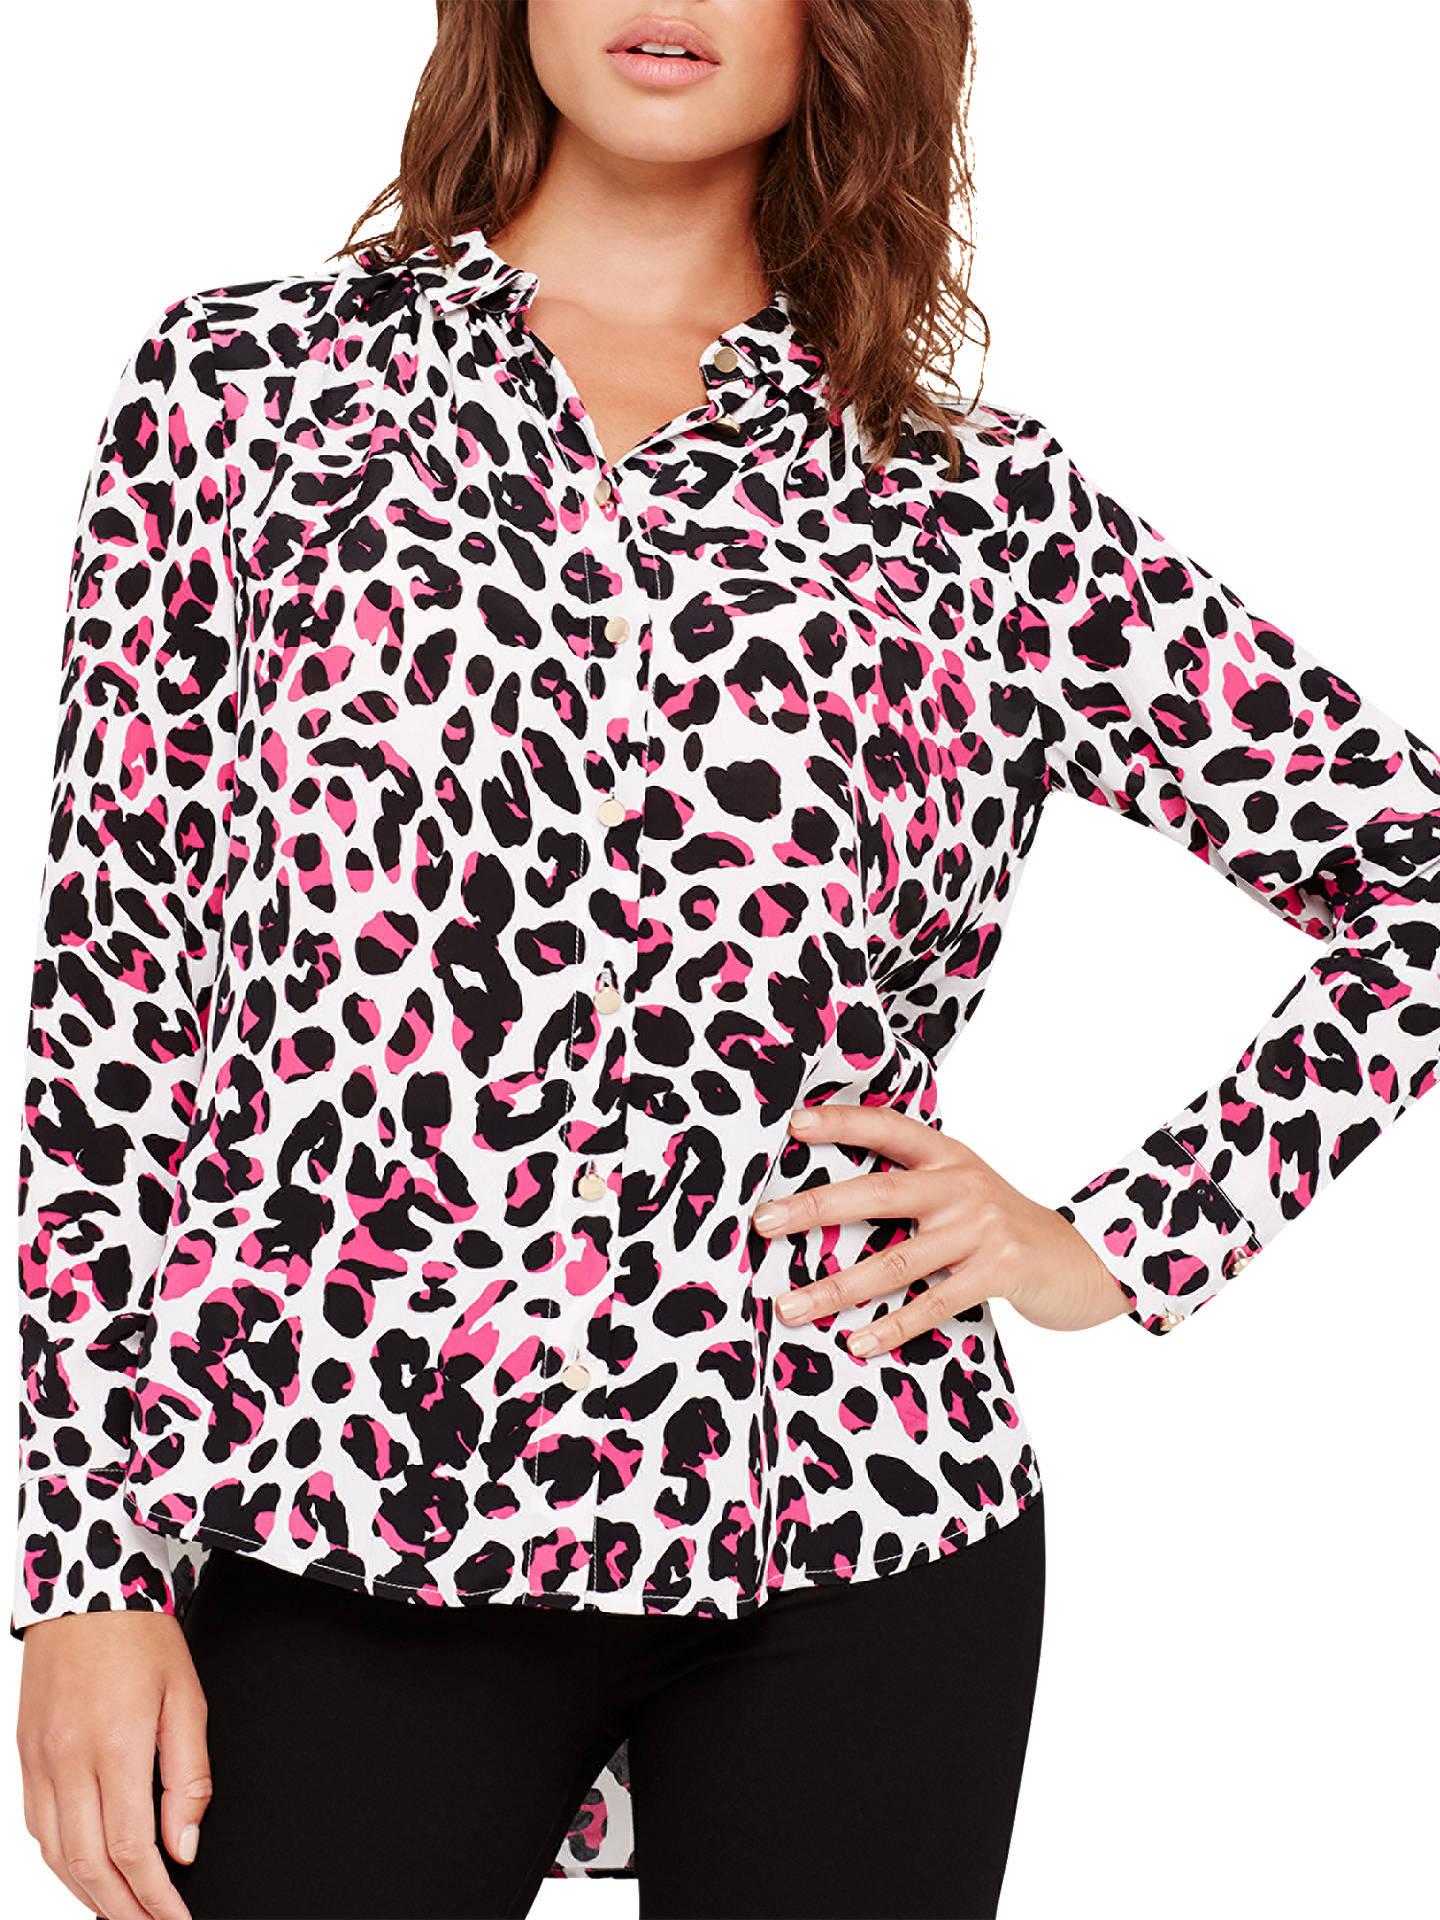 35270a6b59 BuyDamsel in a Dress Urban Leopard Blouse